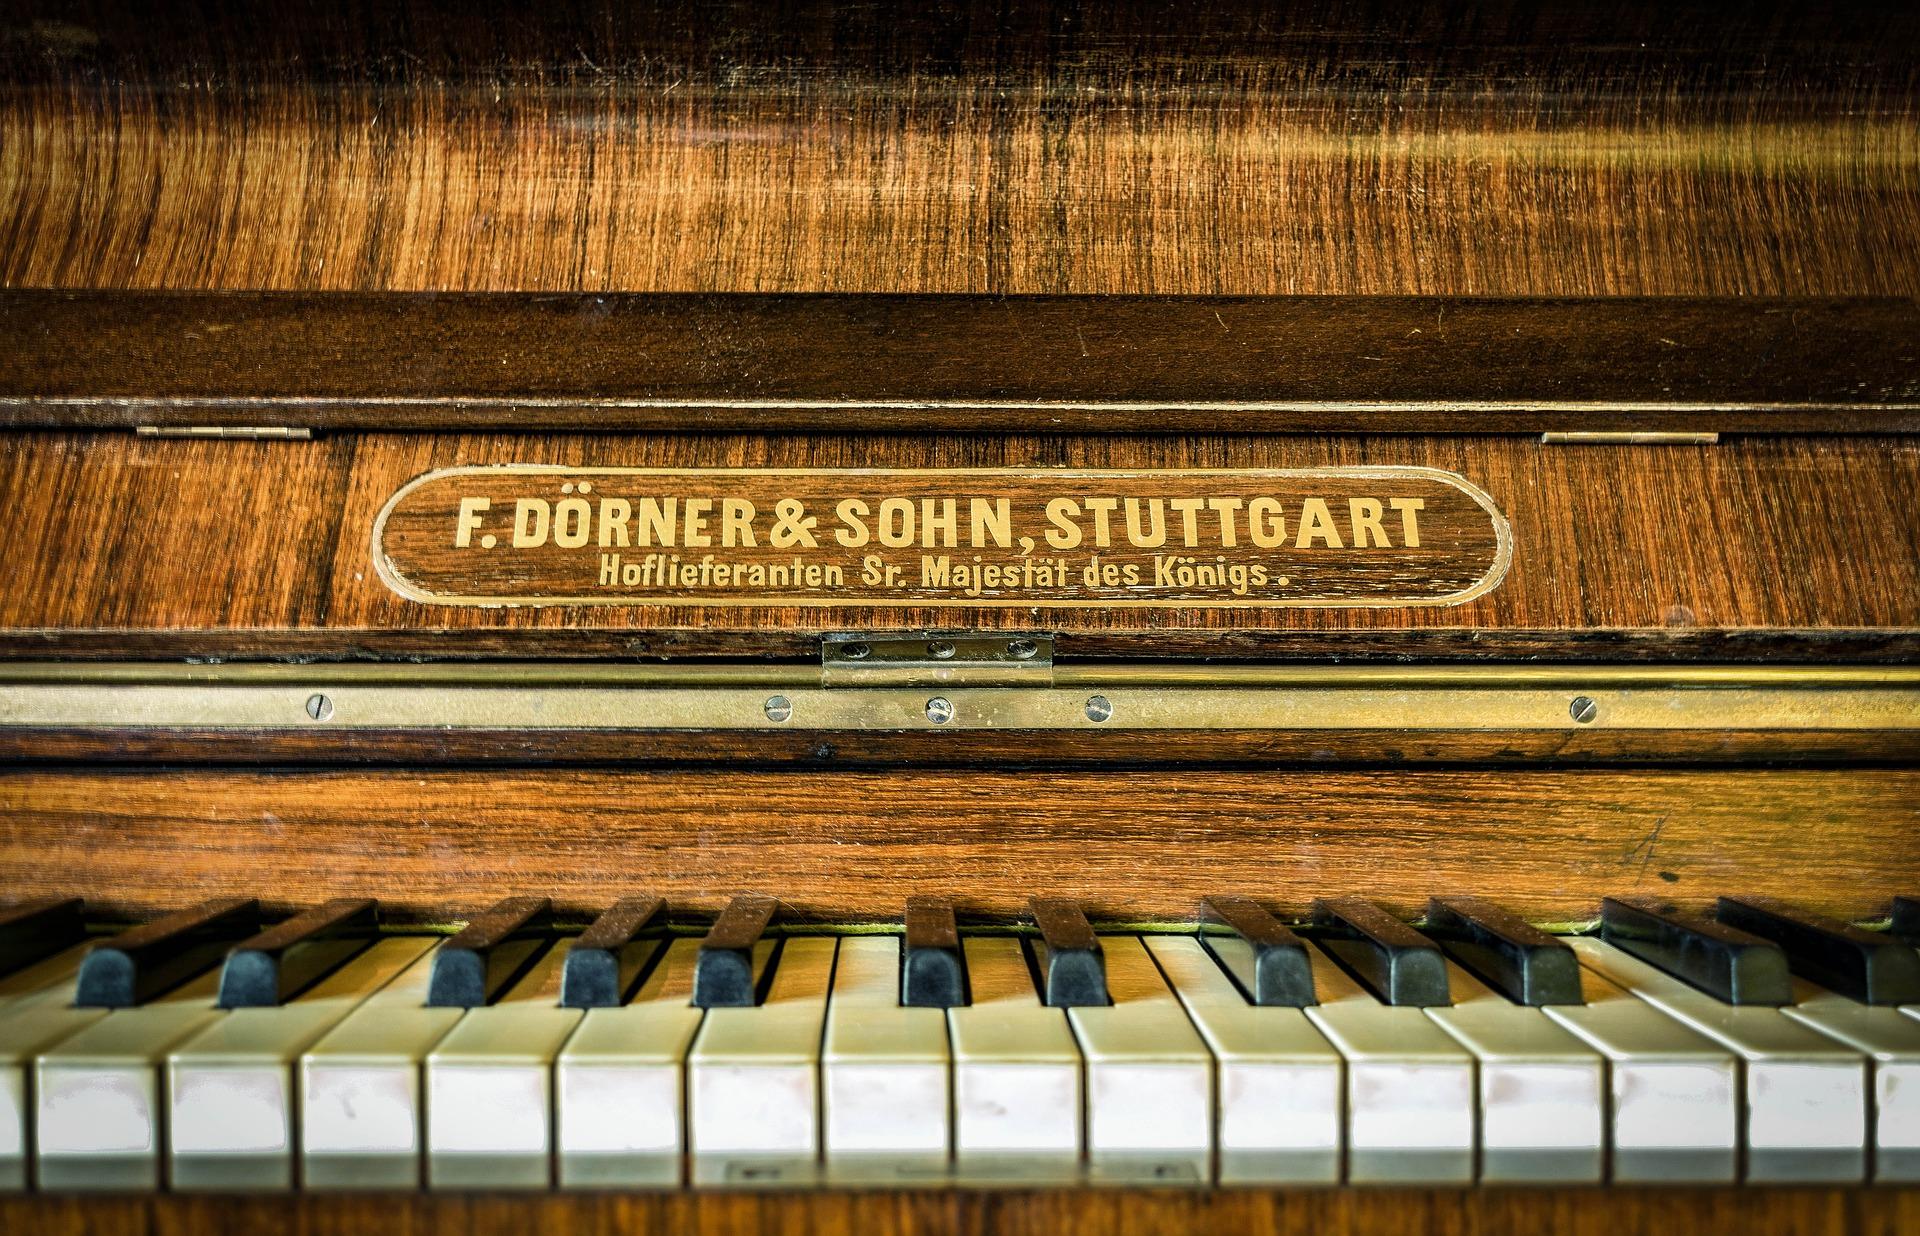 F.Dorner & Sohn, Closeup, Music, Musical, Object, HQ Photo